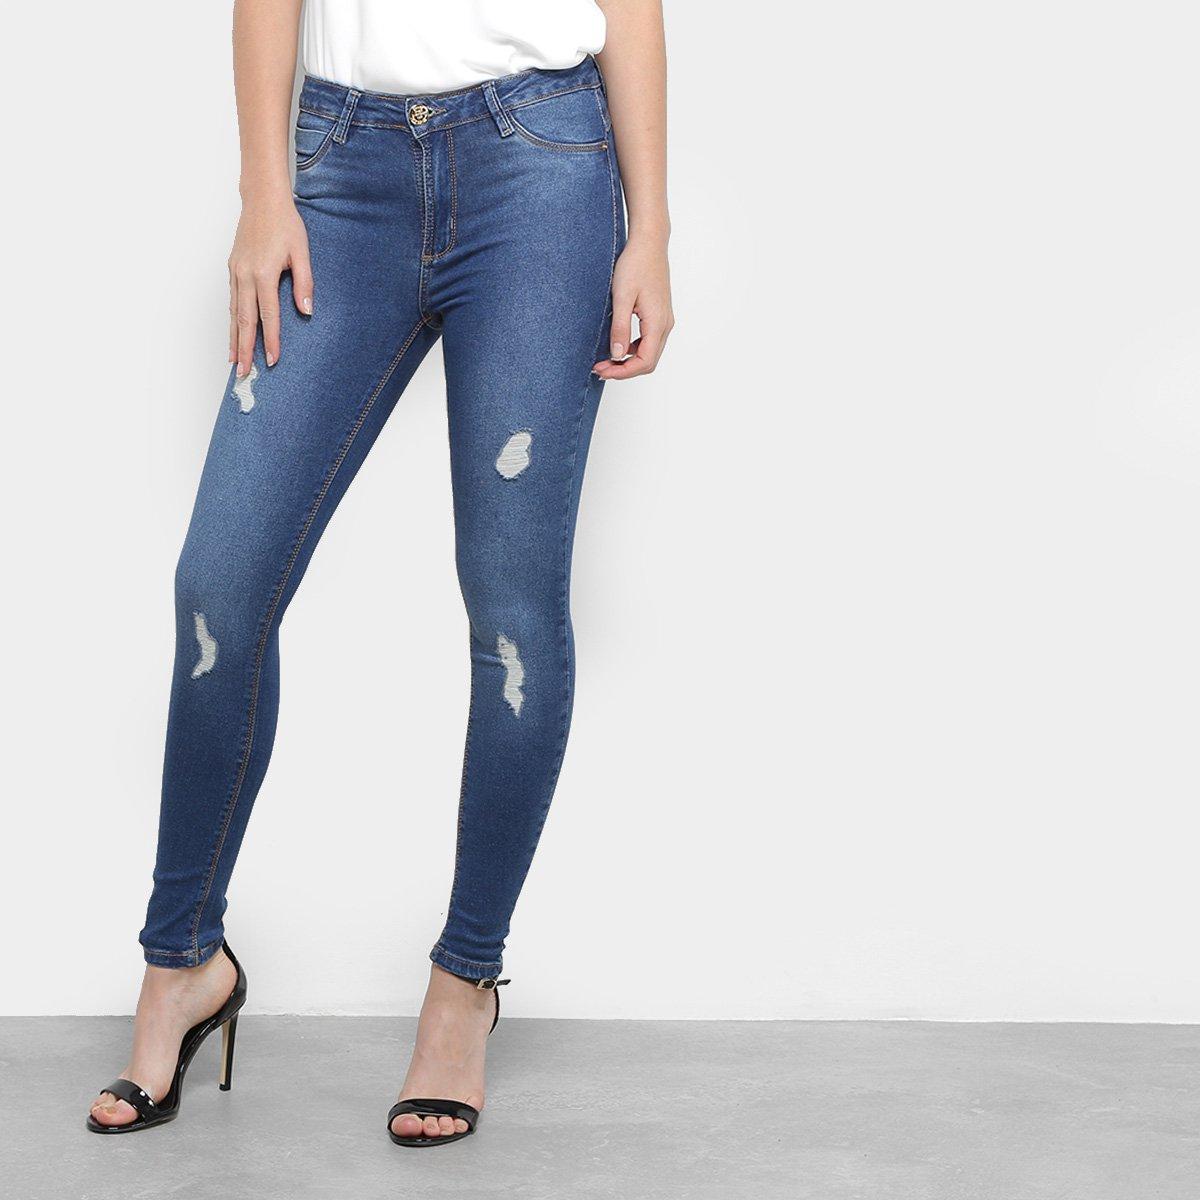 01dd0c9bf Calça jeans skinny sawary puídos cintura média feminina undefined jpg  1200x1200 Undefined sawary calcas femininas